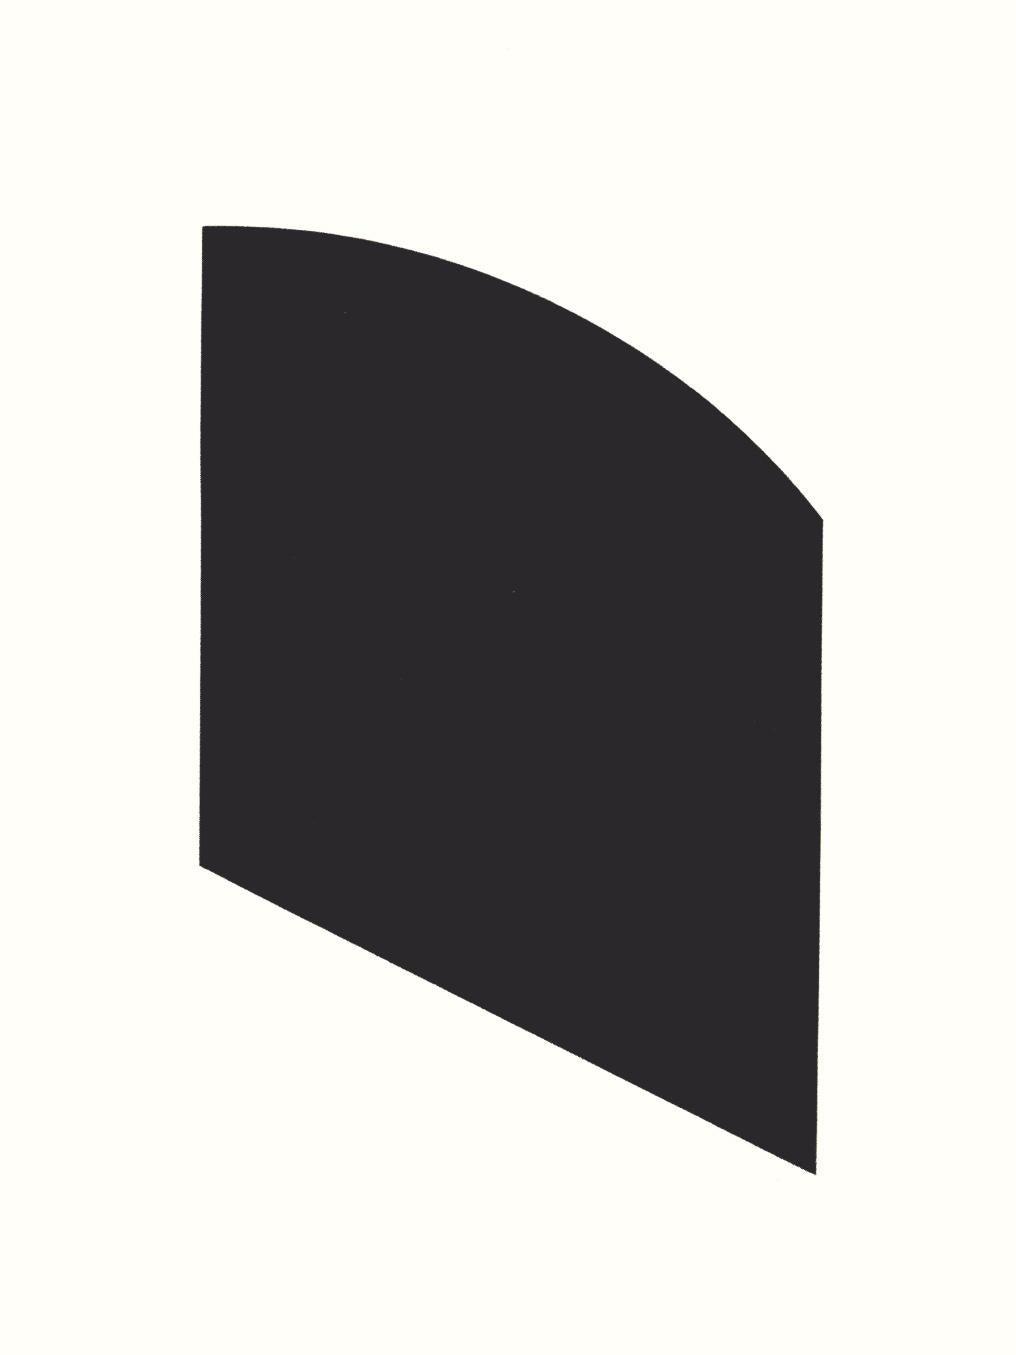 Ellsworth Kelly, Black Shape Lithograph, 2003